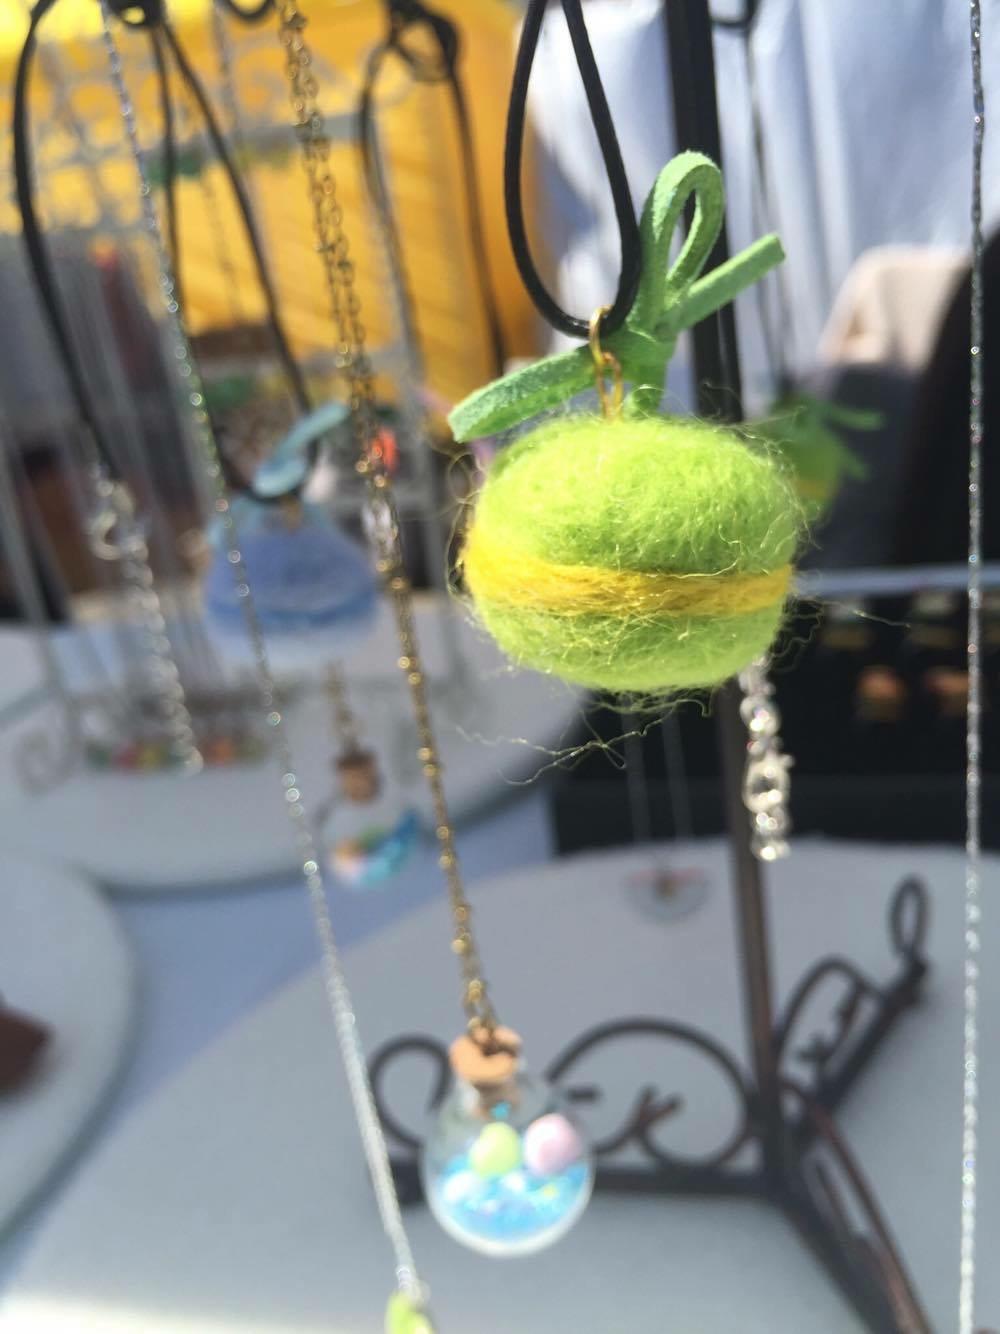 Cute Macaron Necklace!